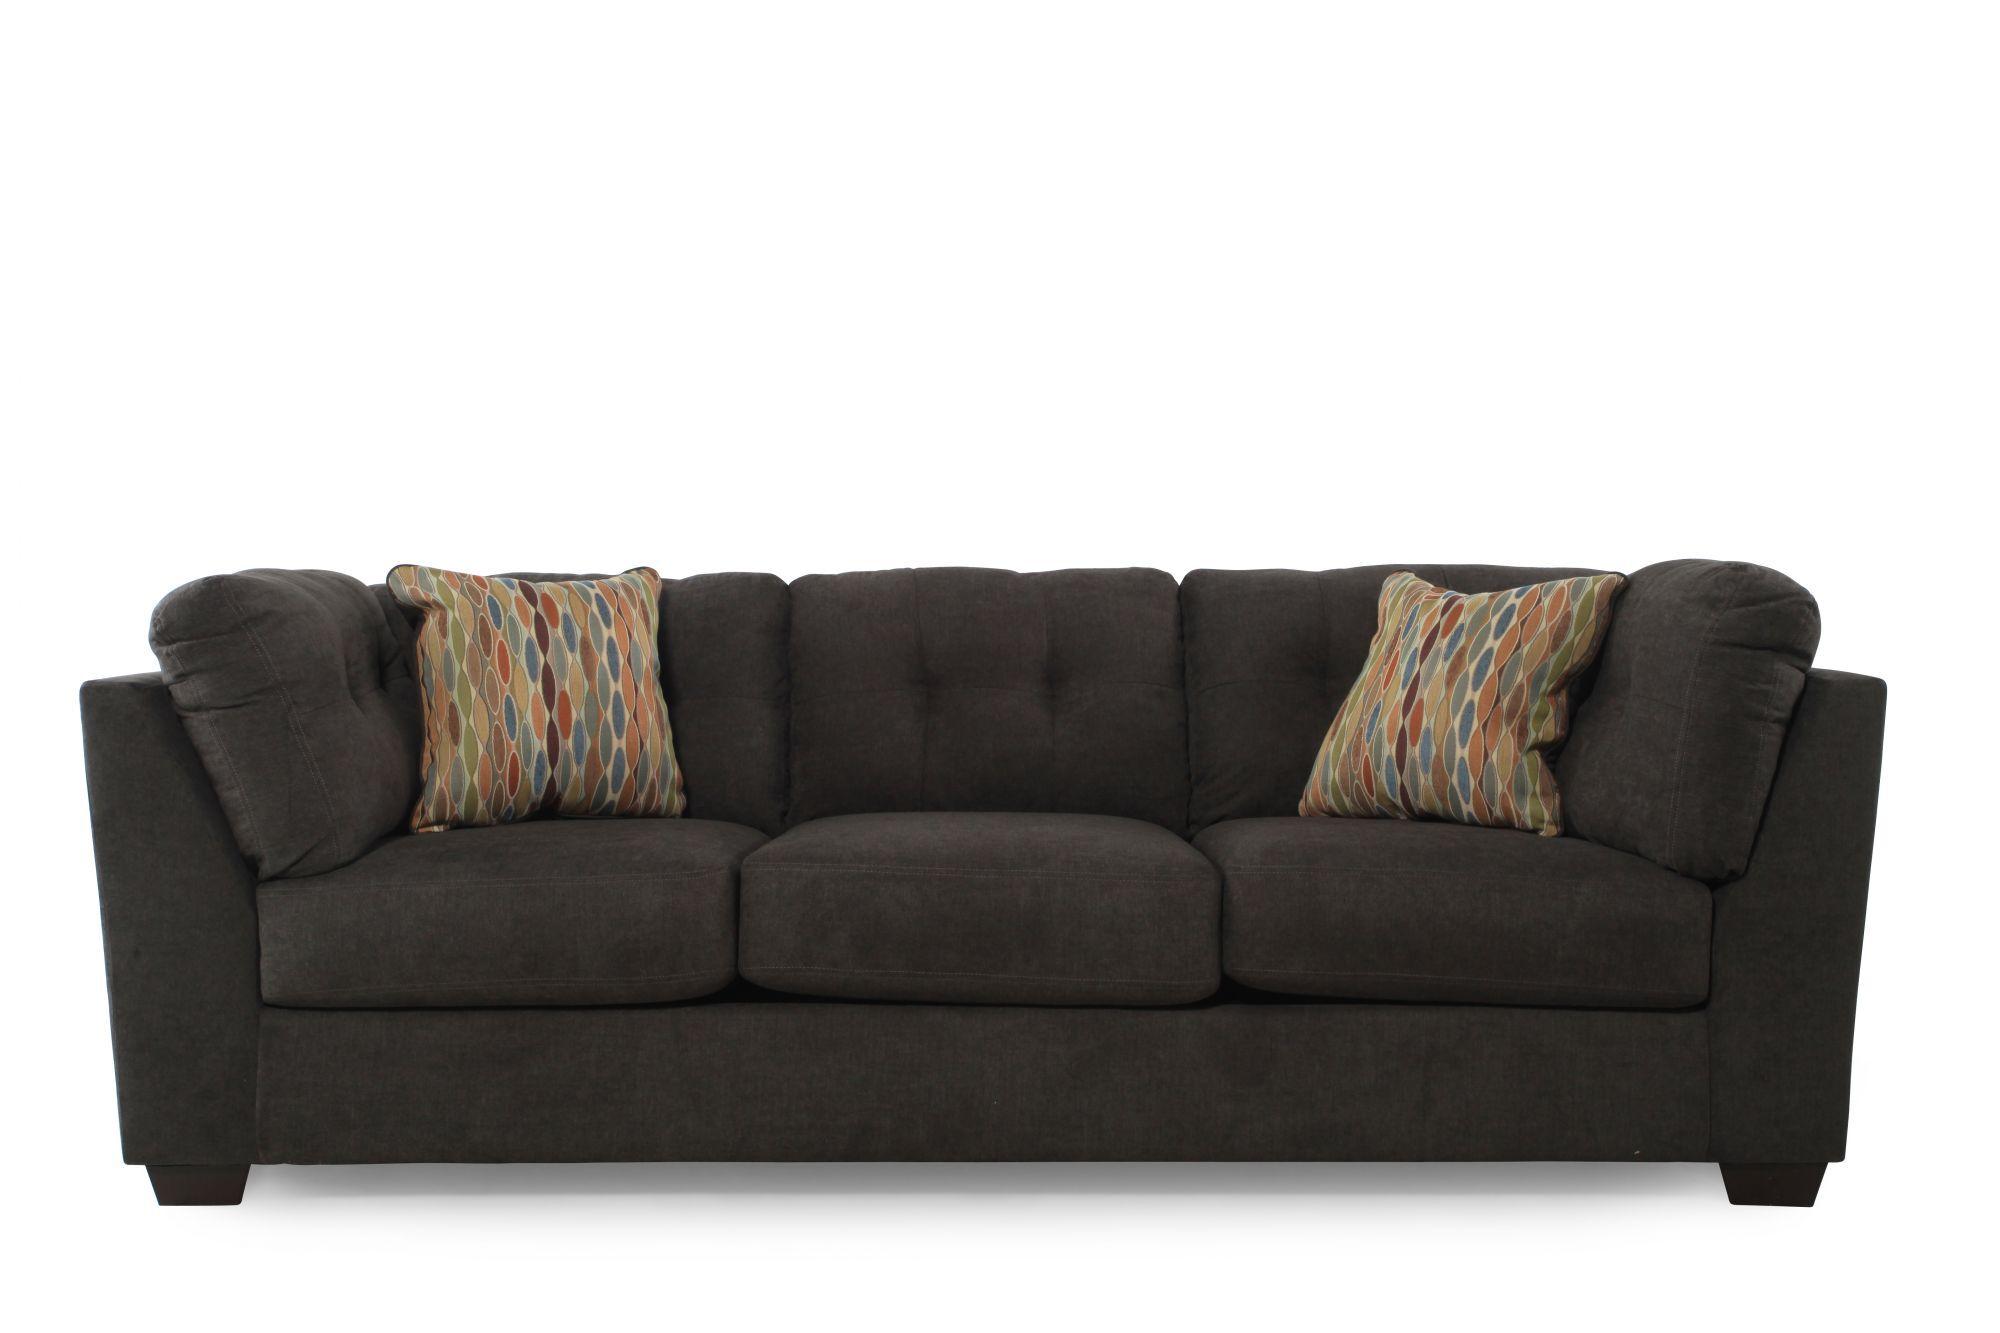 Images Tufted 103u0026quot; Microfiber Sofa In Chocolate Brown Tufted 103u0026quot; Microfiber  Sofa In Chocolate Brown